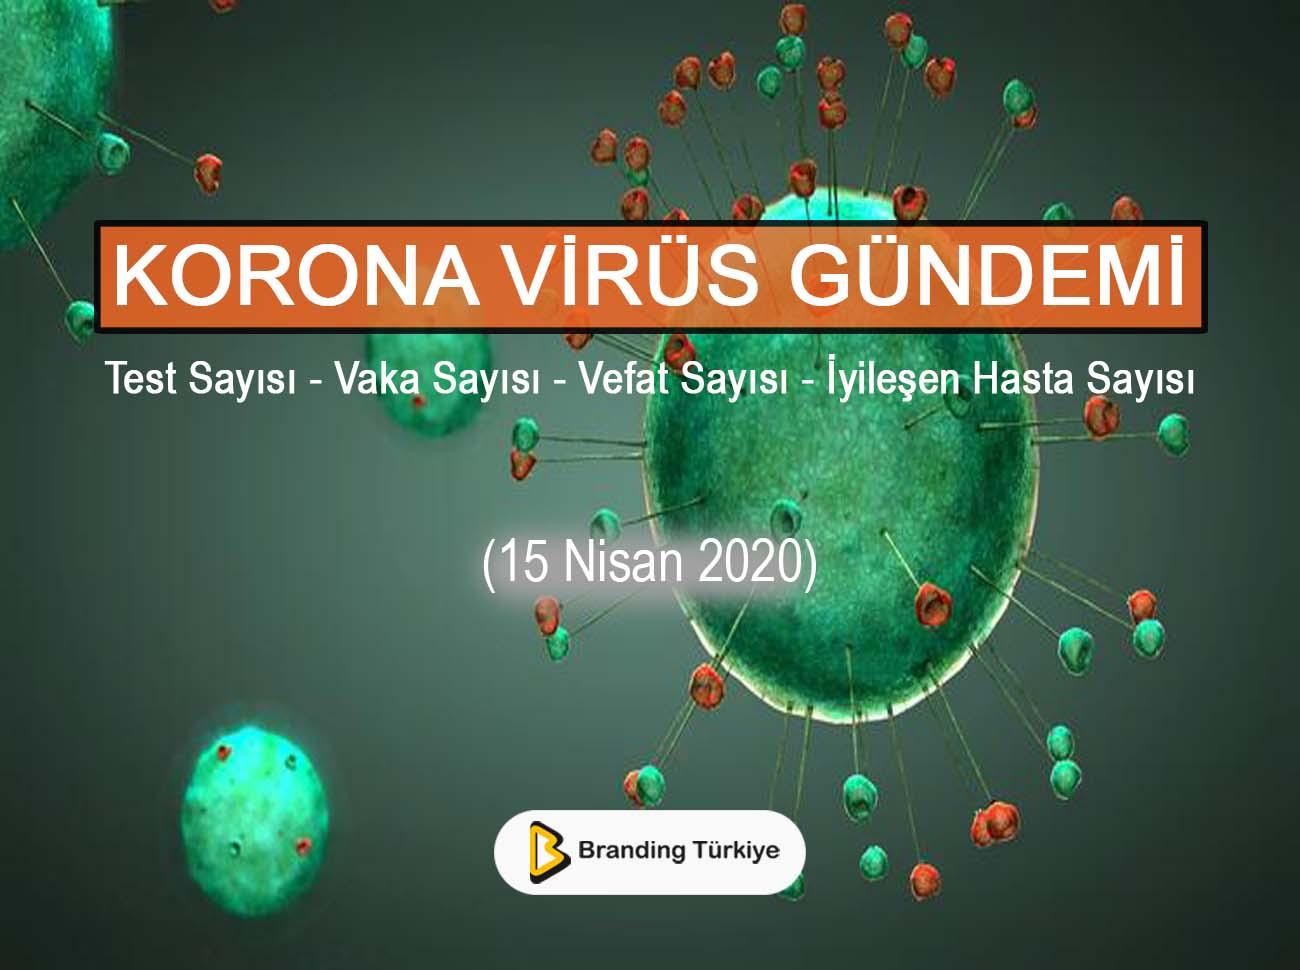 Korona Virüs Gündemi (15 Nisan 2020)